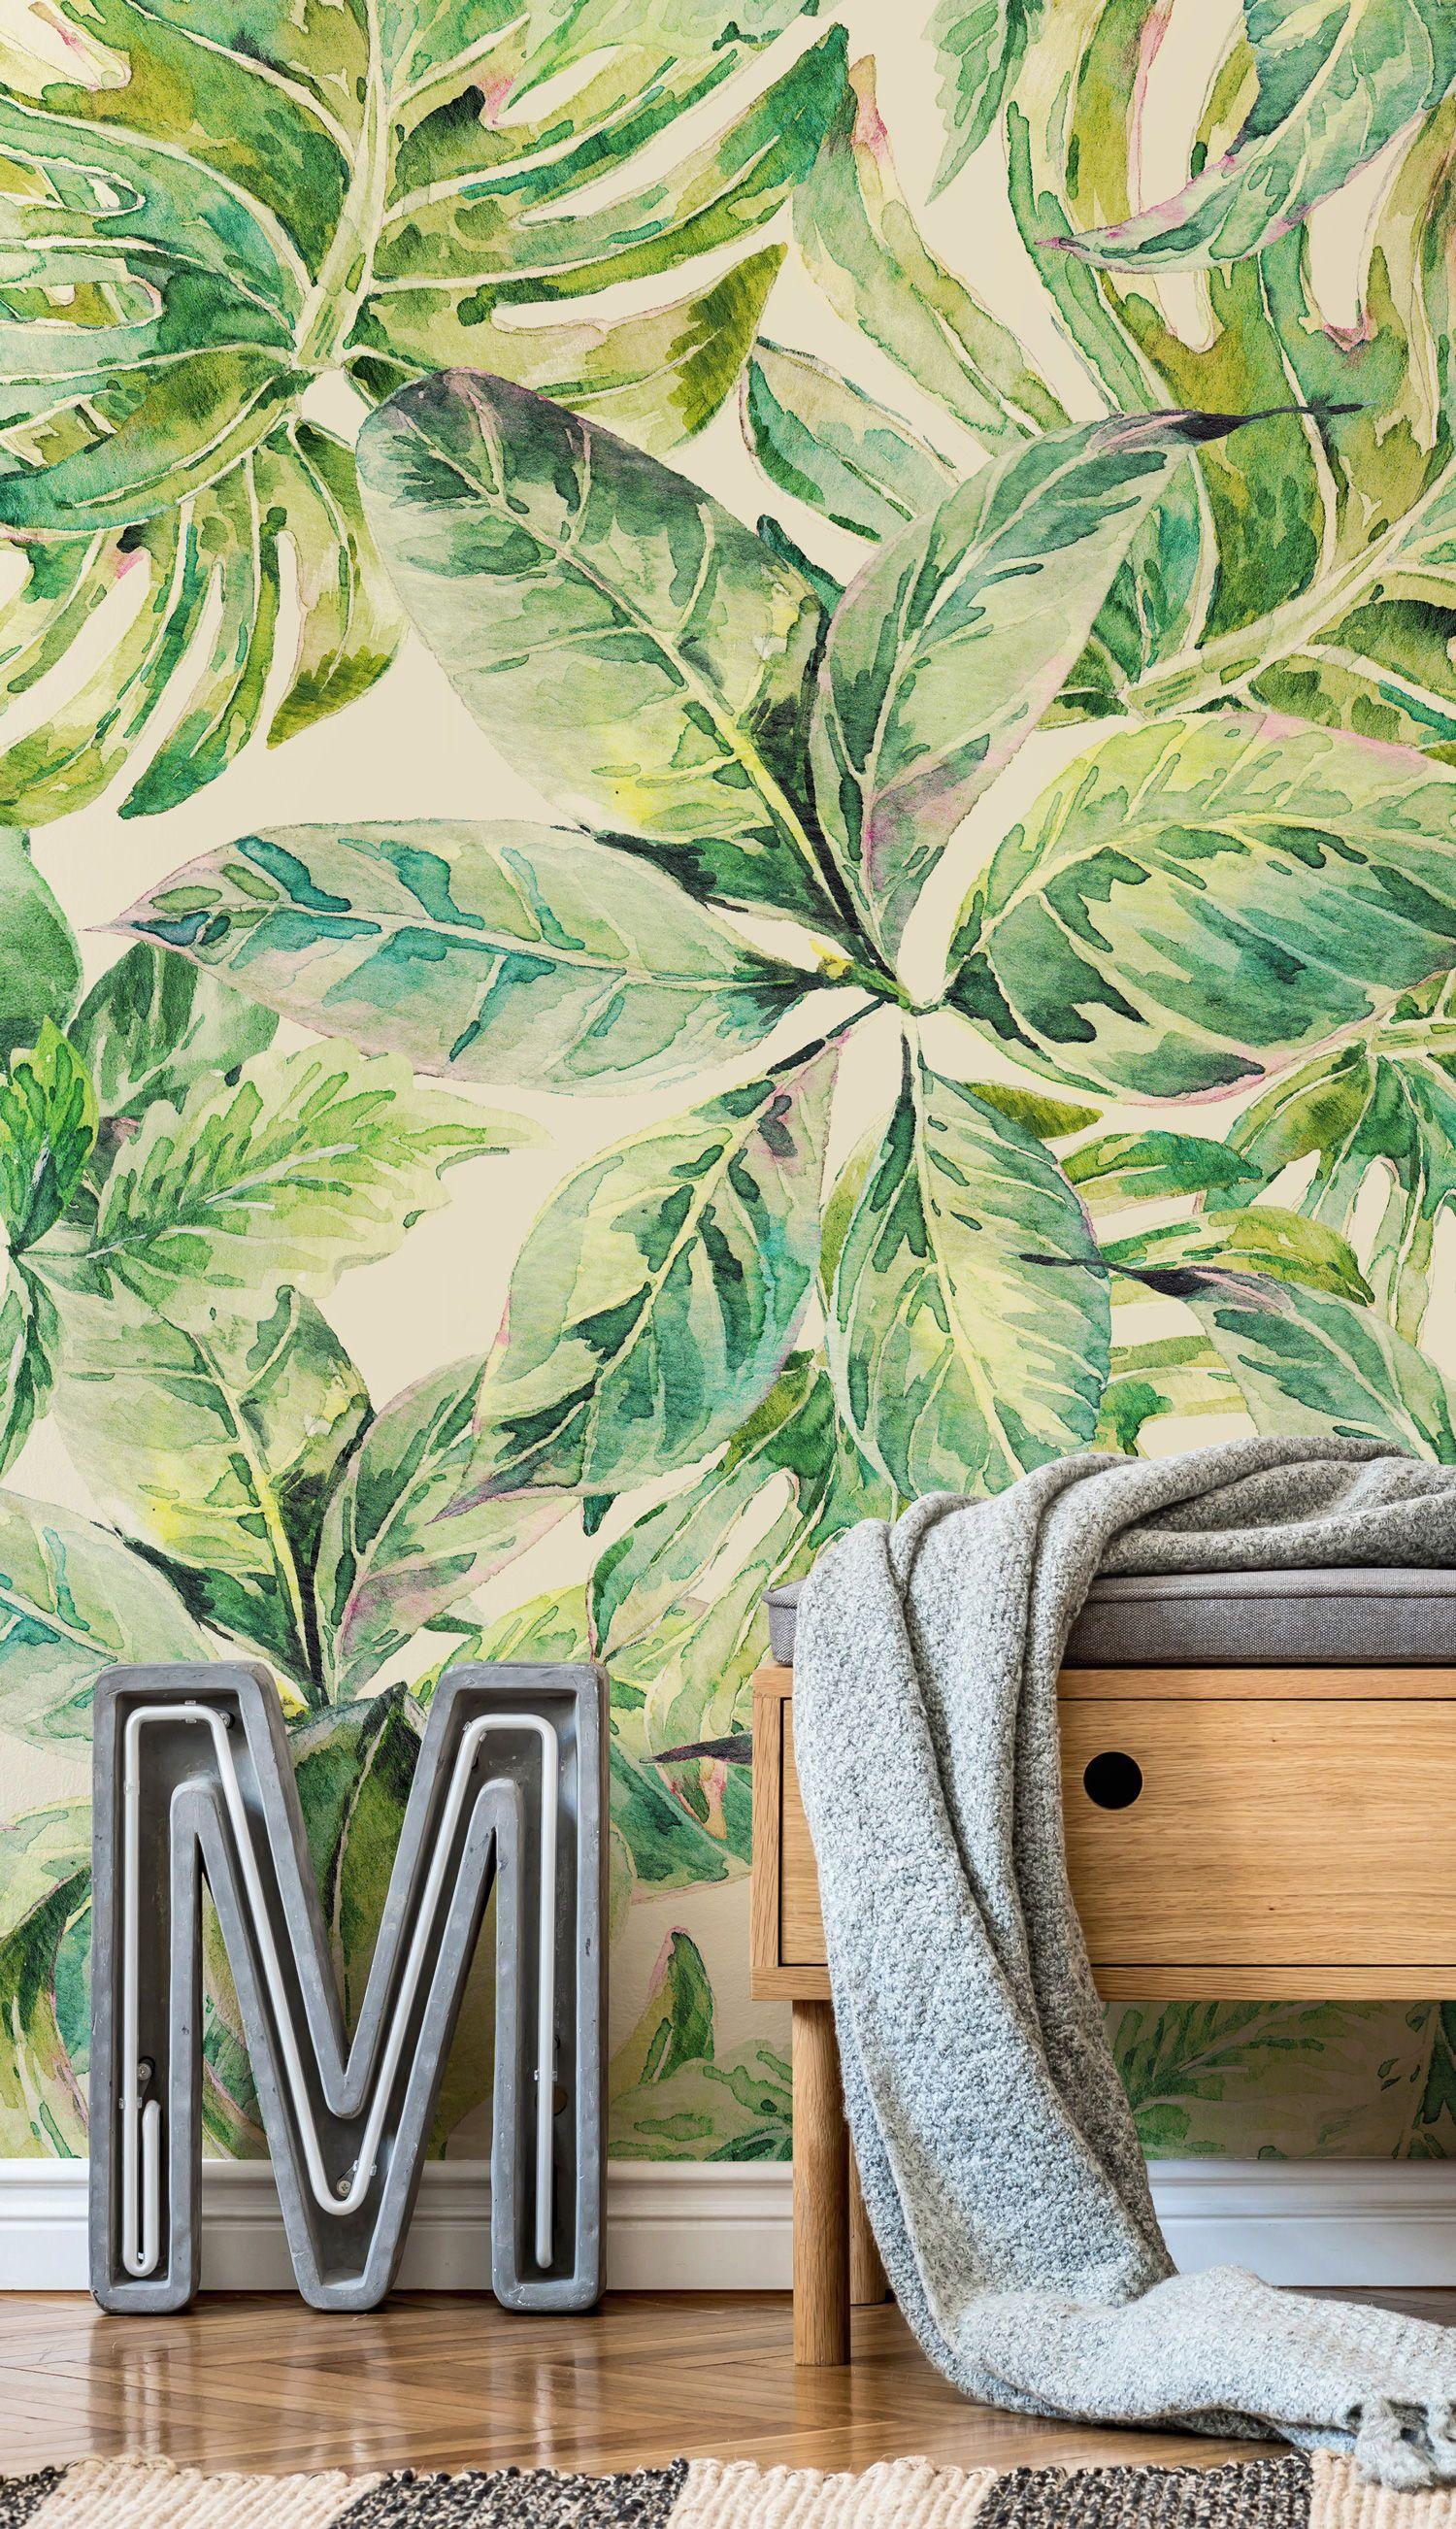 Leaf Wallpaper Wall Murals Wallsauce Eu Leaf Wallpaper Green Leaf Wallpaper Poppy Wallpaper